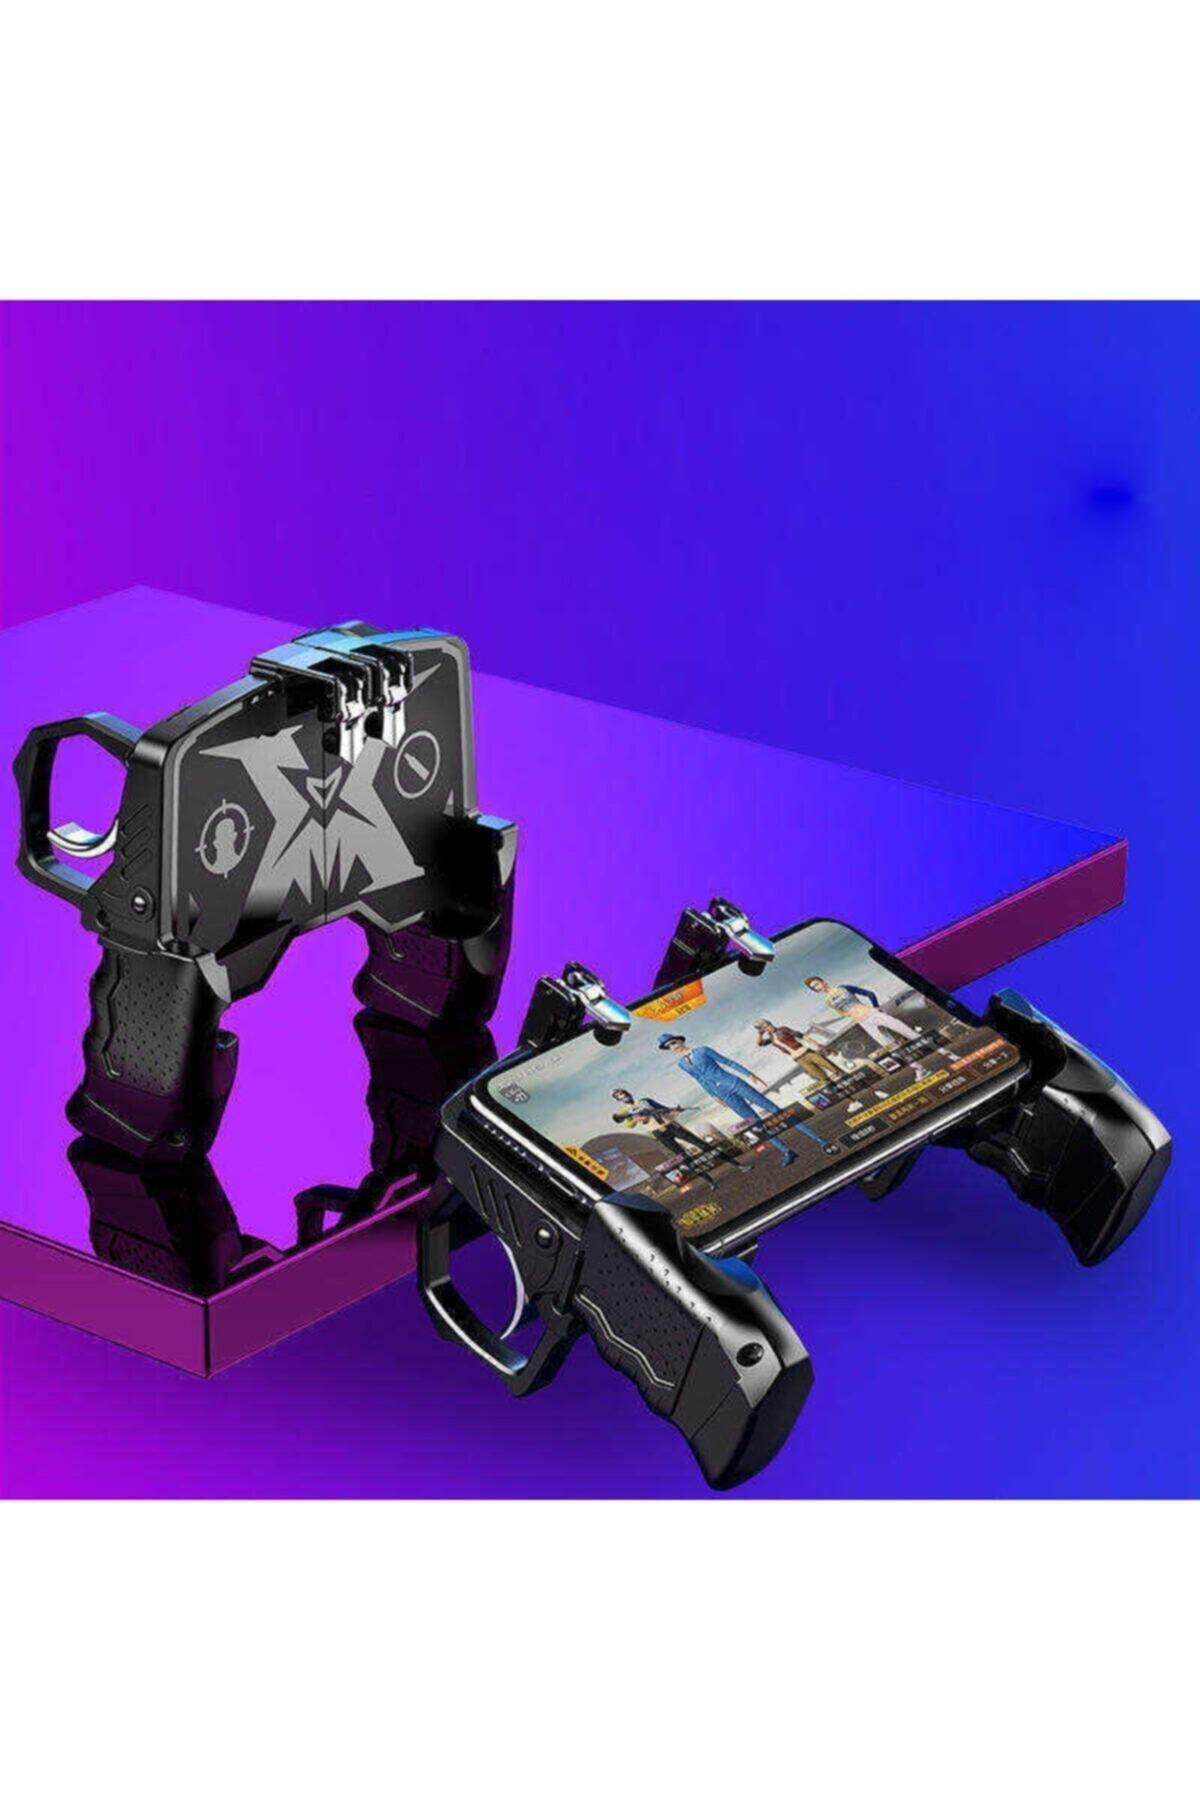 dijimedia Pubg Mobil Game Oyun Aparatı K21 Oyun Konsolu 2